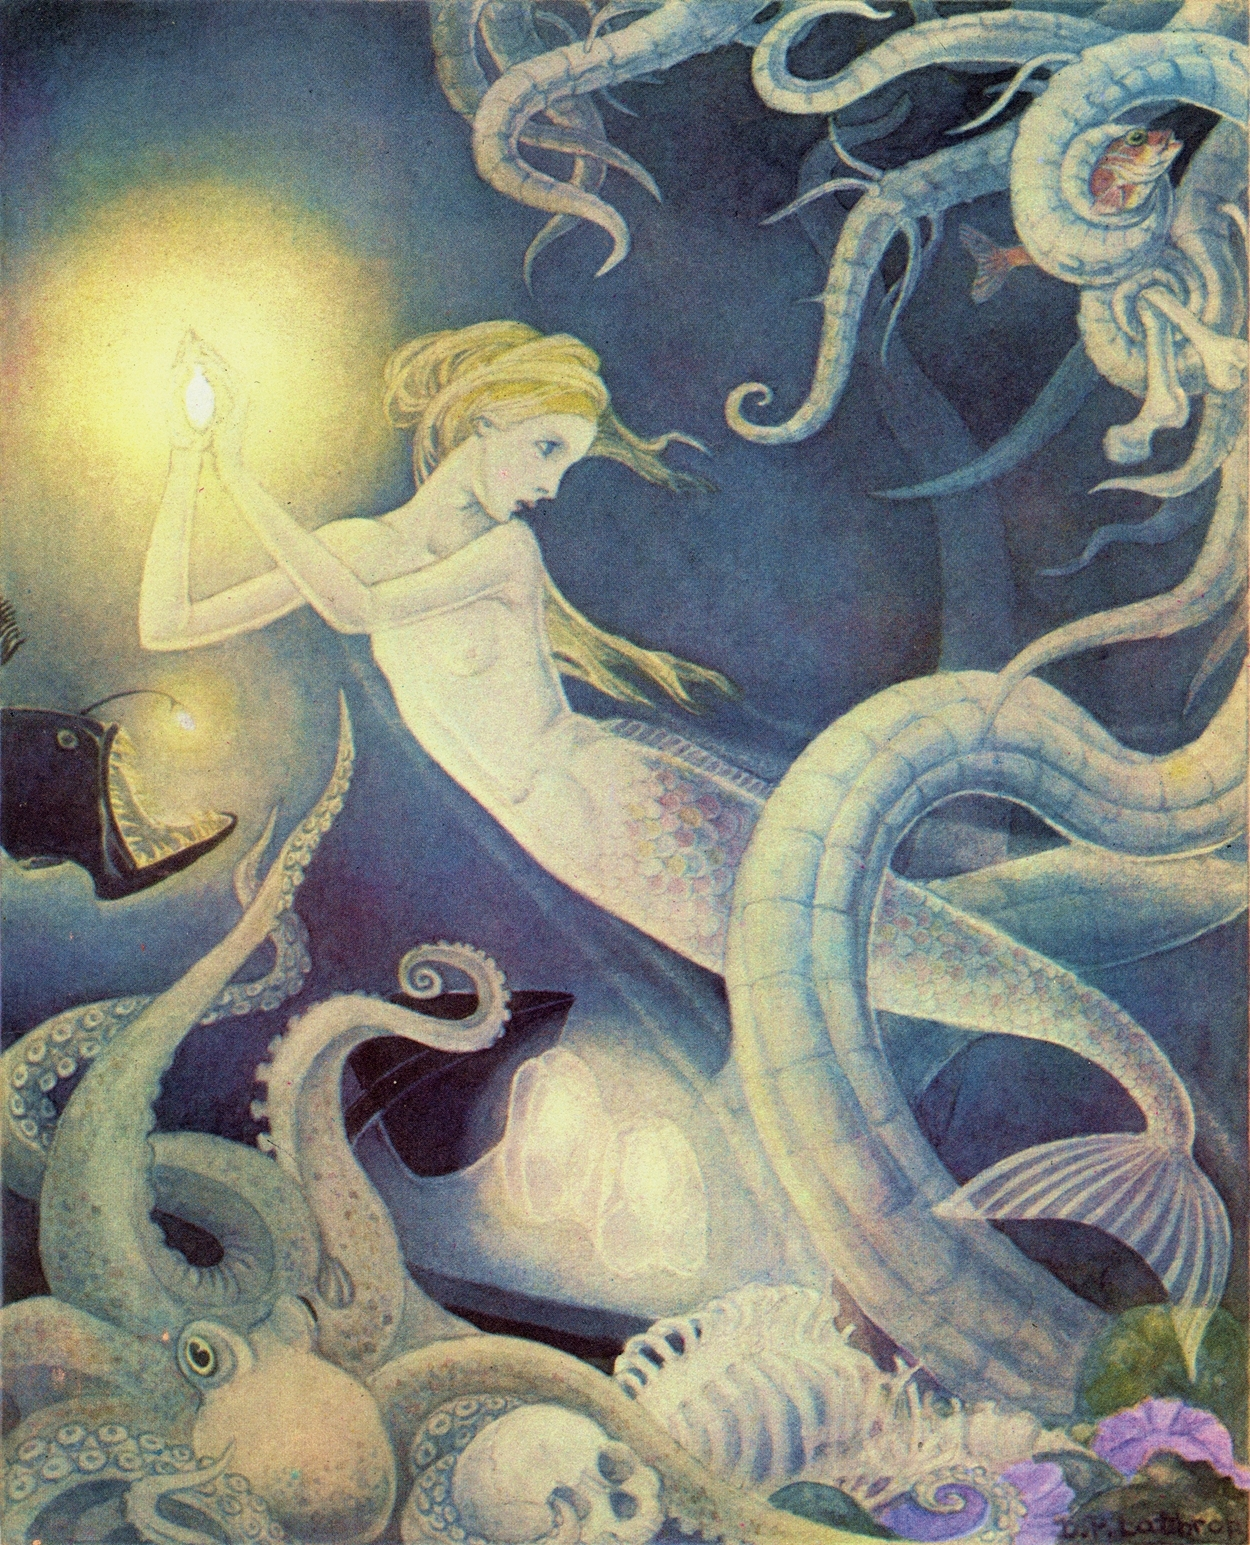 Art Of Narrative Dorothy Lathrop The Little Mermaid 1939